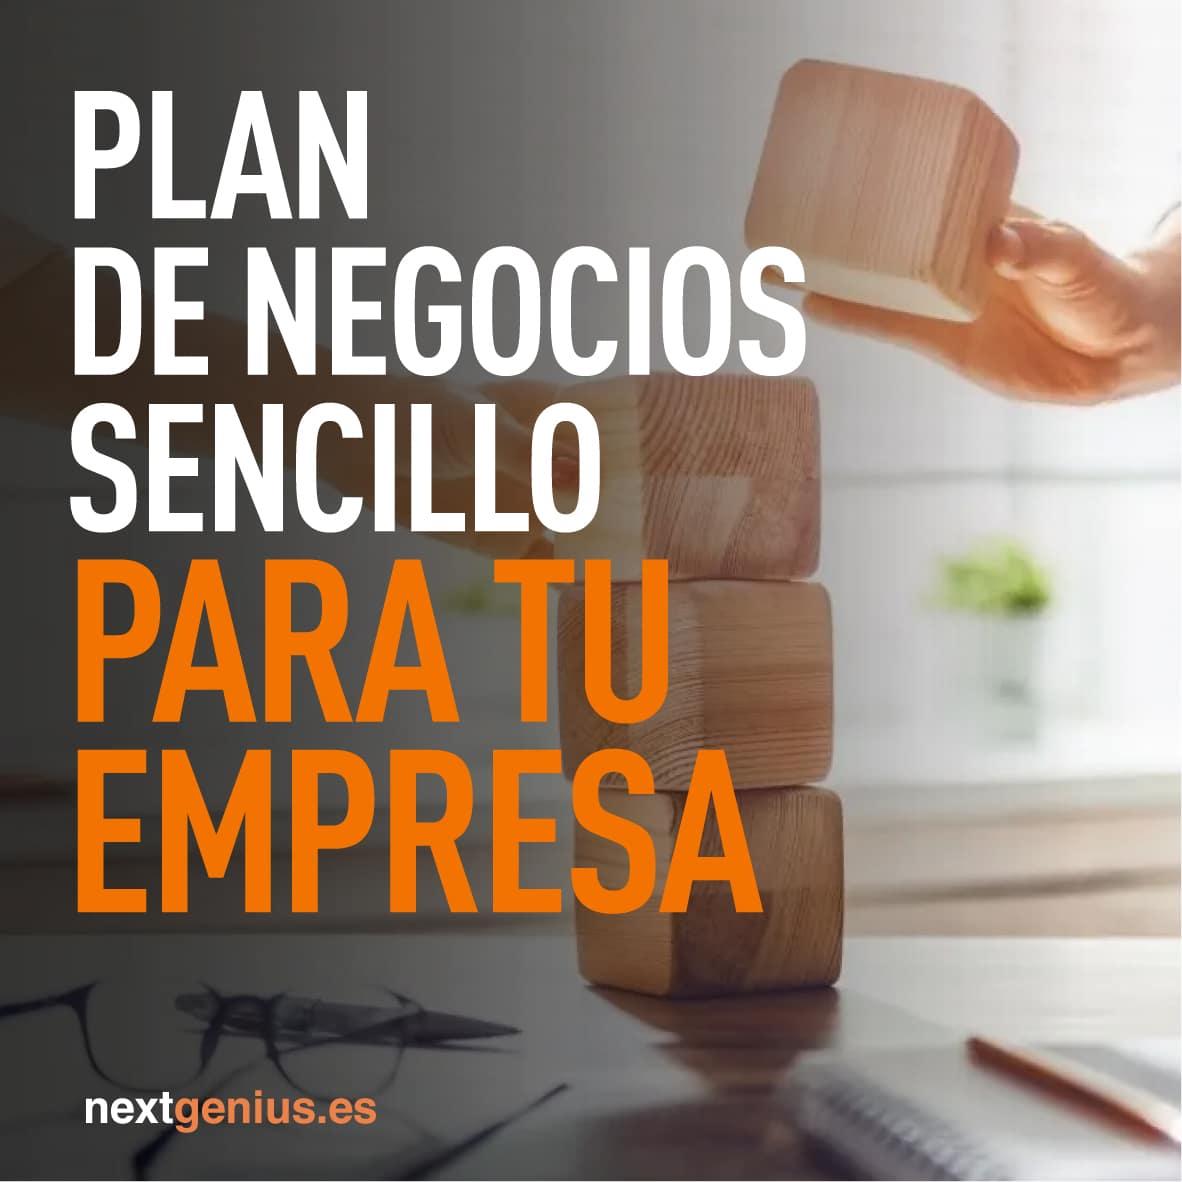 Un plan de negocios sencillo para tu empresa.